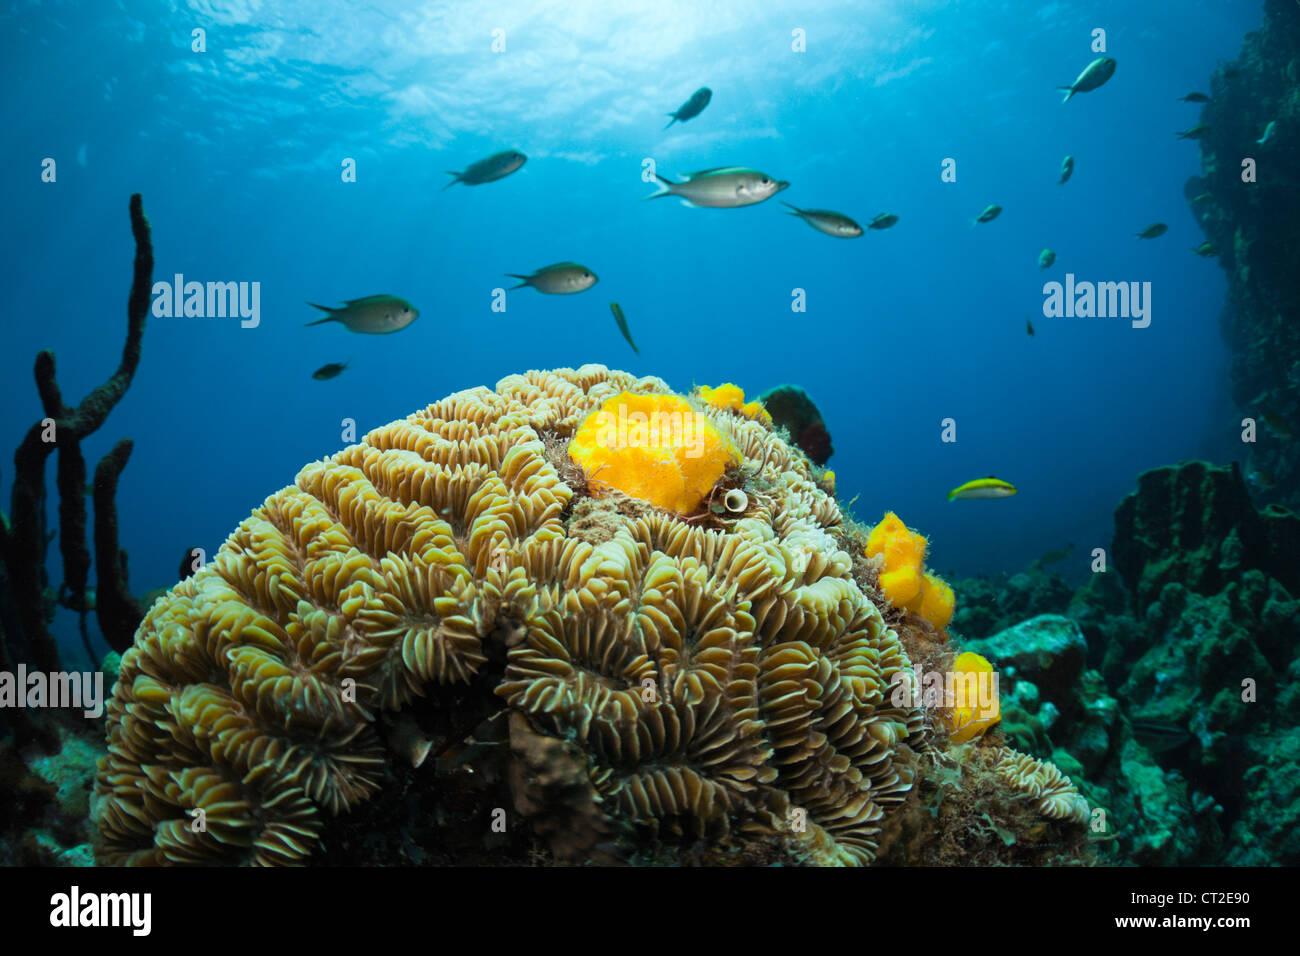 Caribbean Coral Reef, Caribbean Sea, Dominica - Stock Image